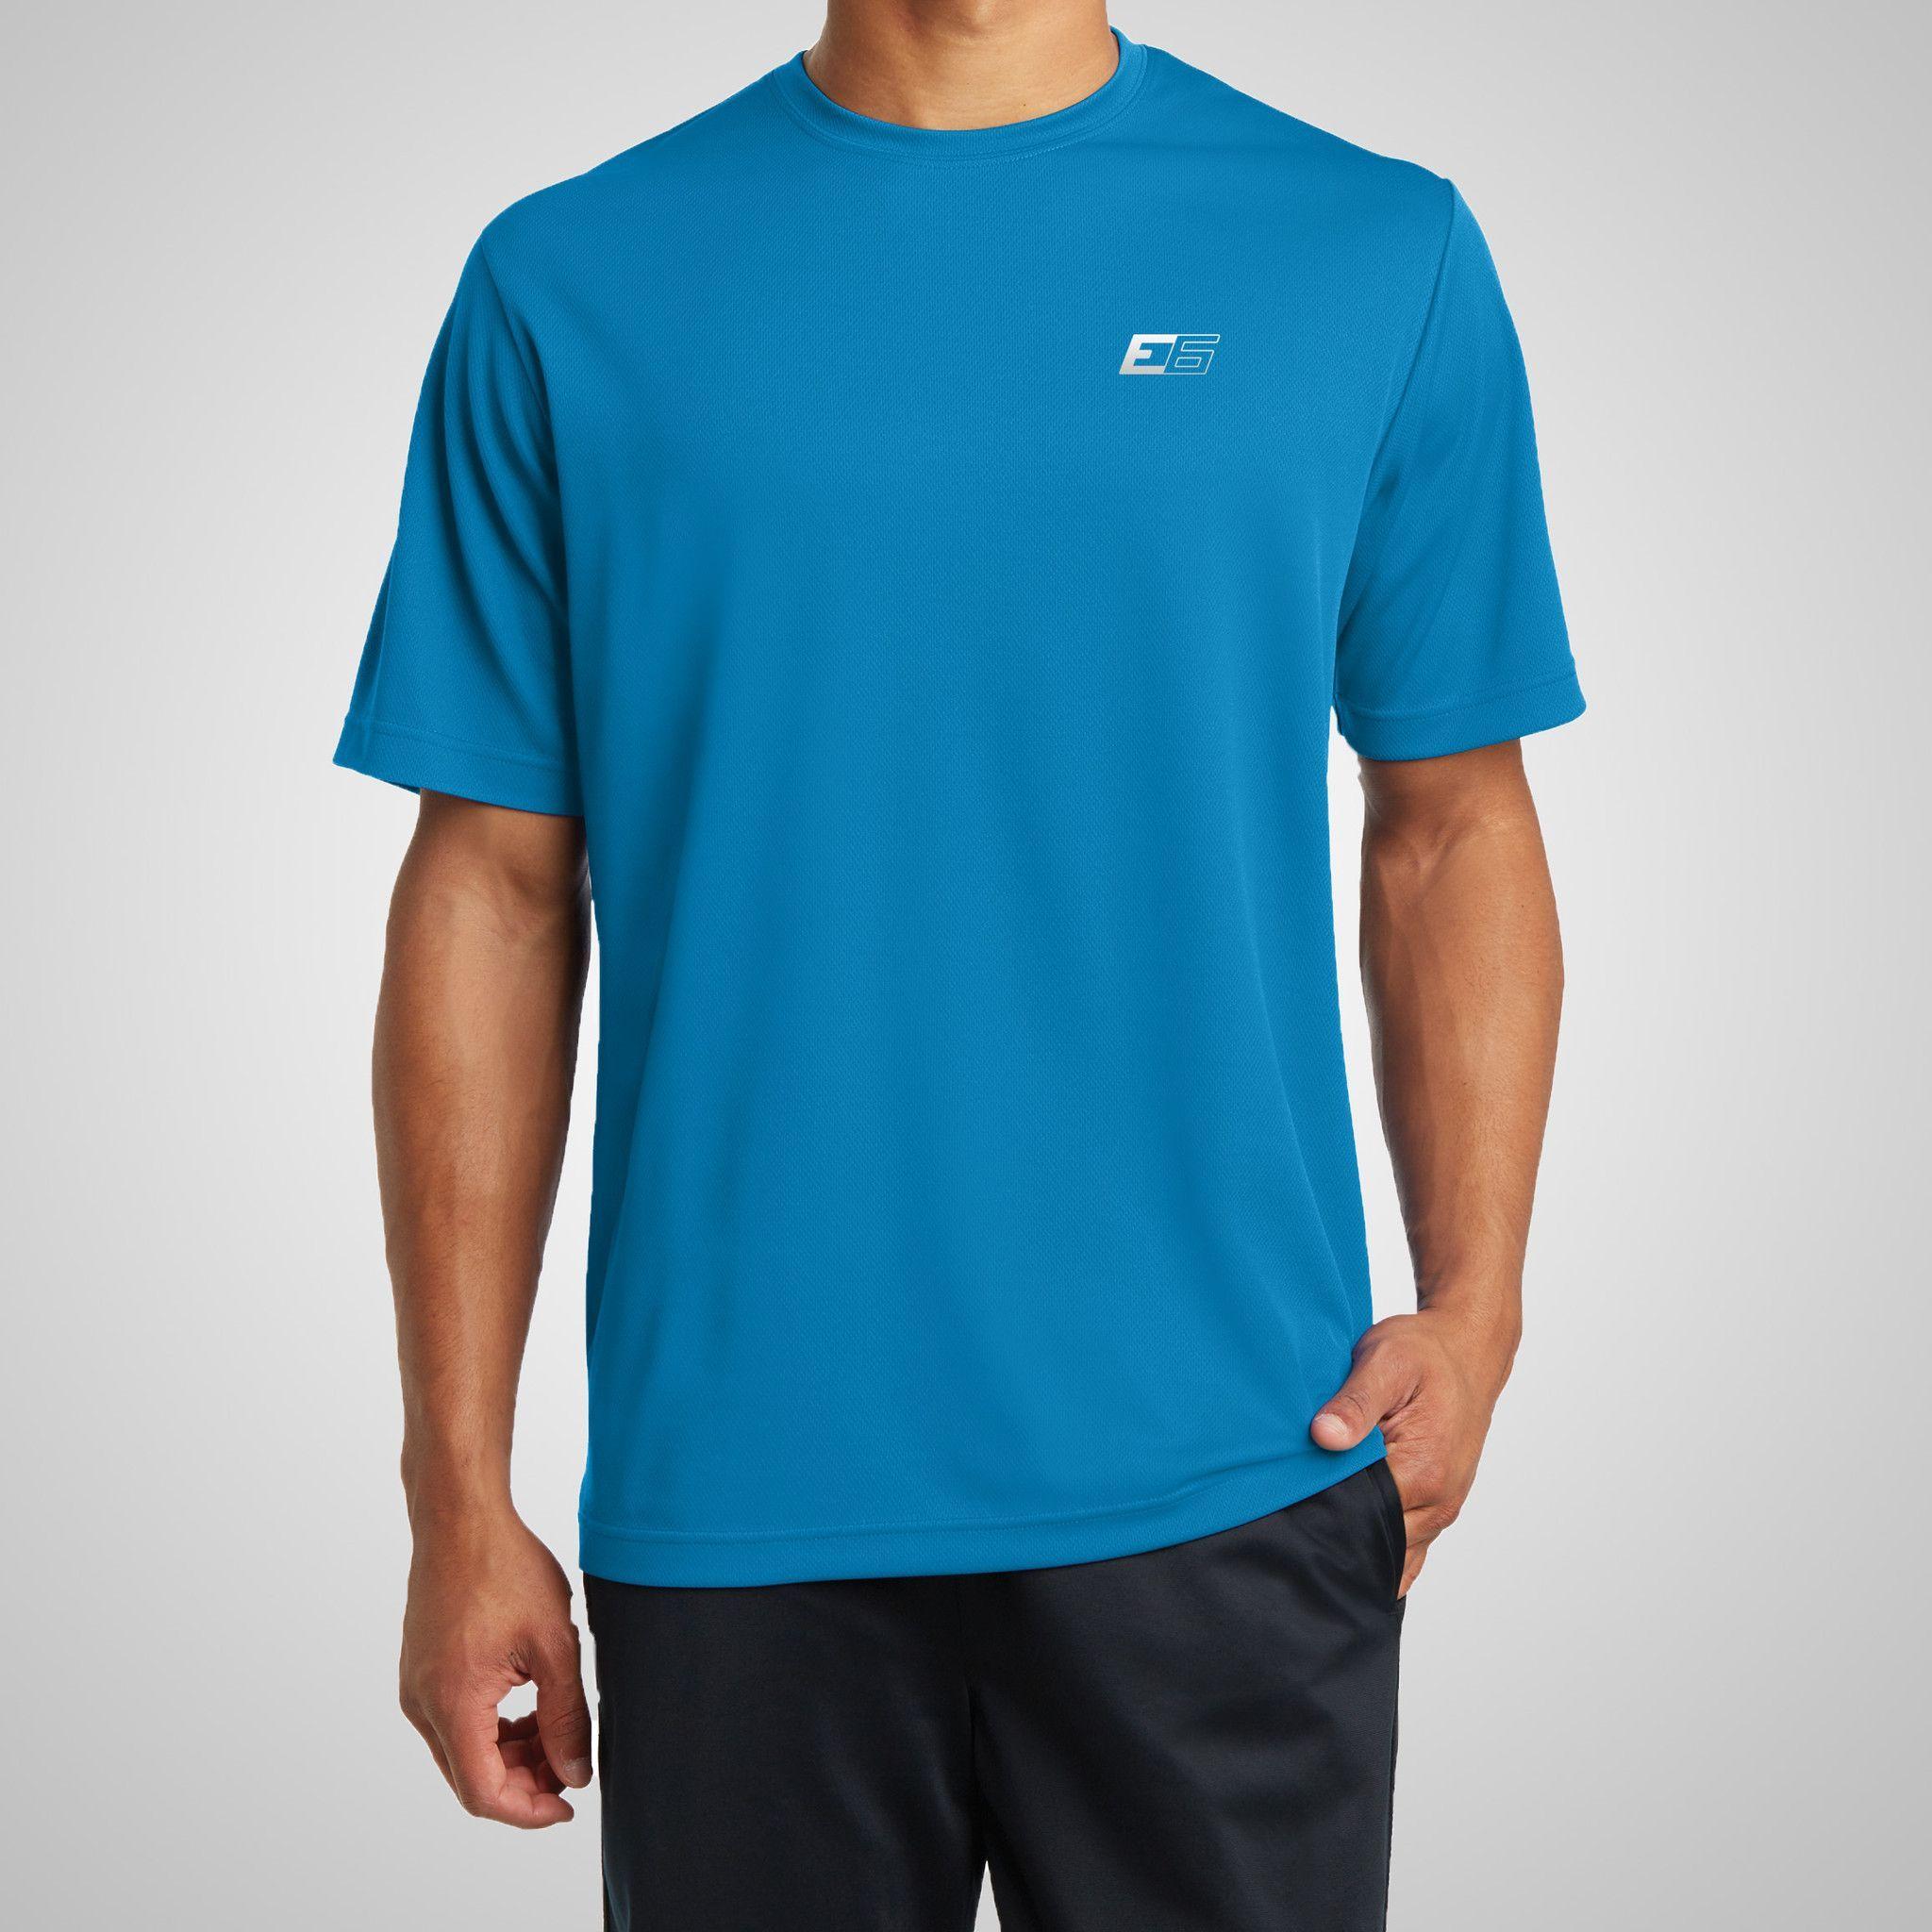 E6 Mesh Training T-Shirt